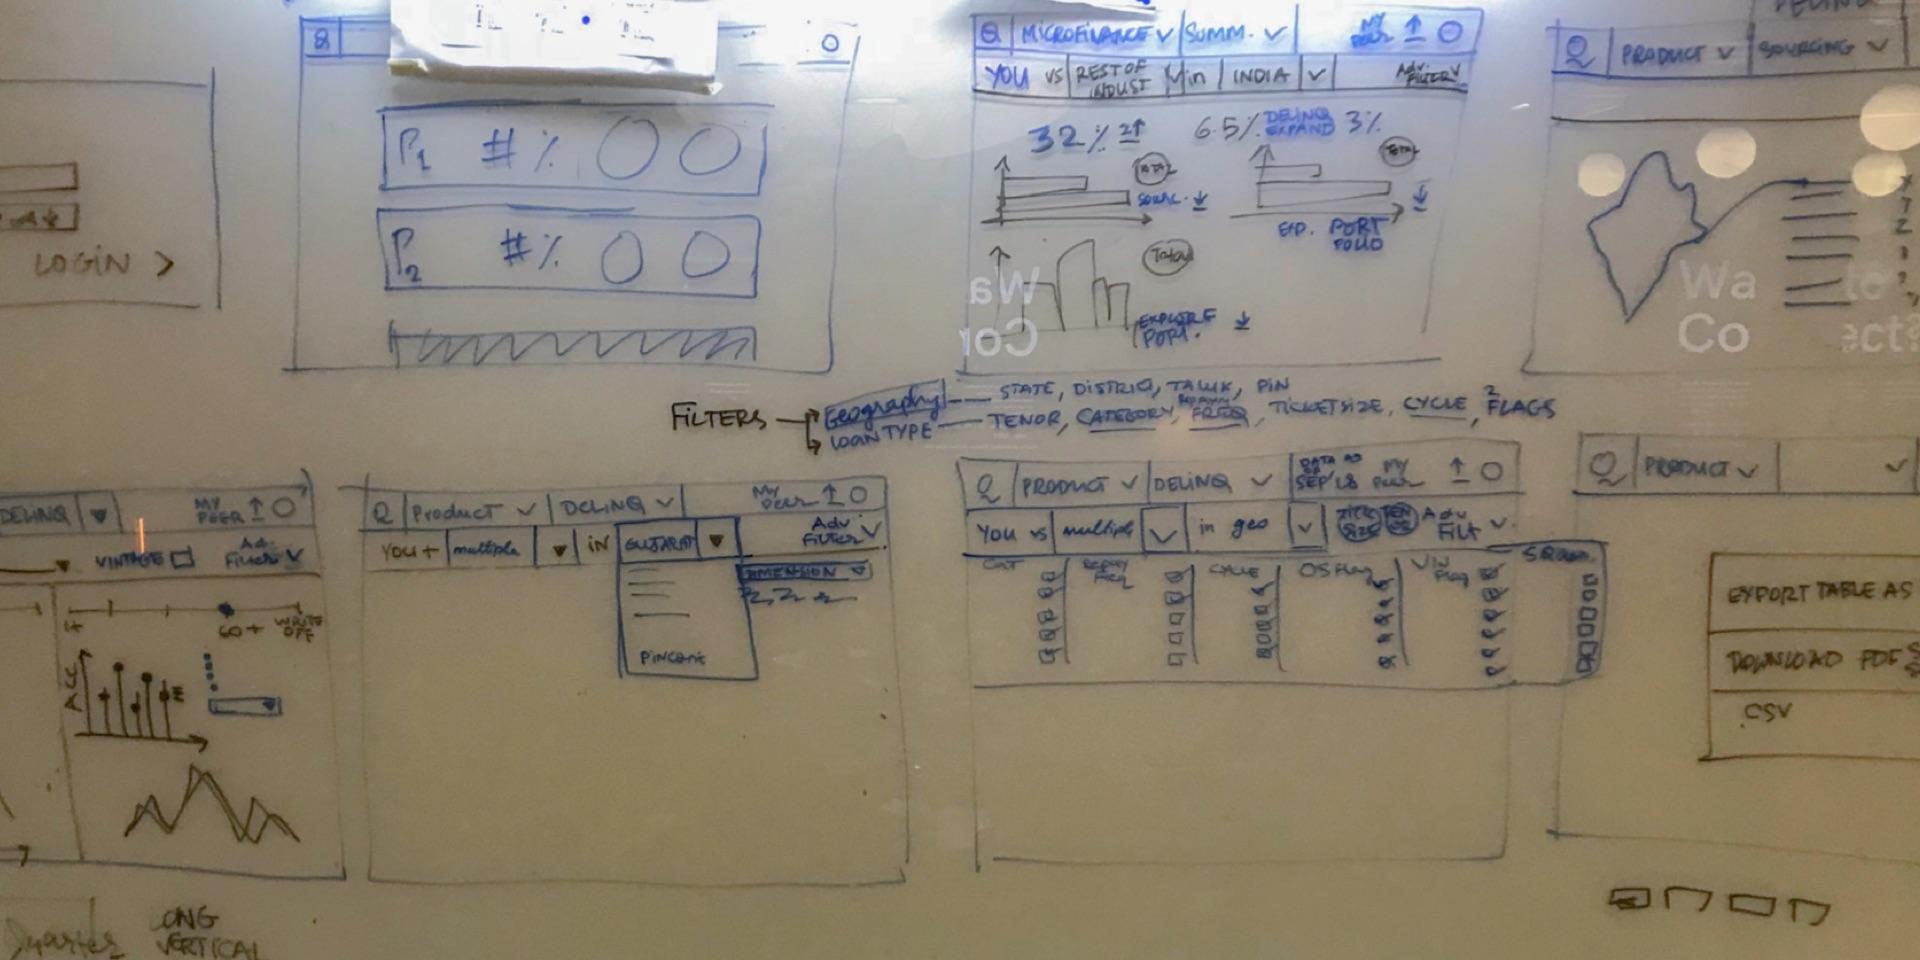 Design Sprint story board session